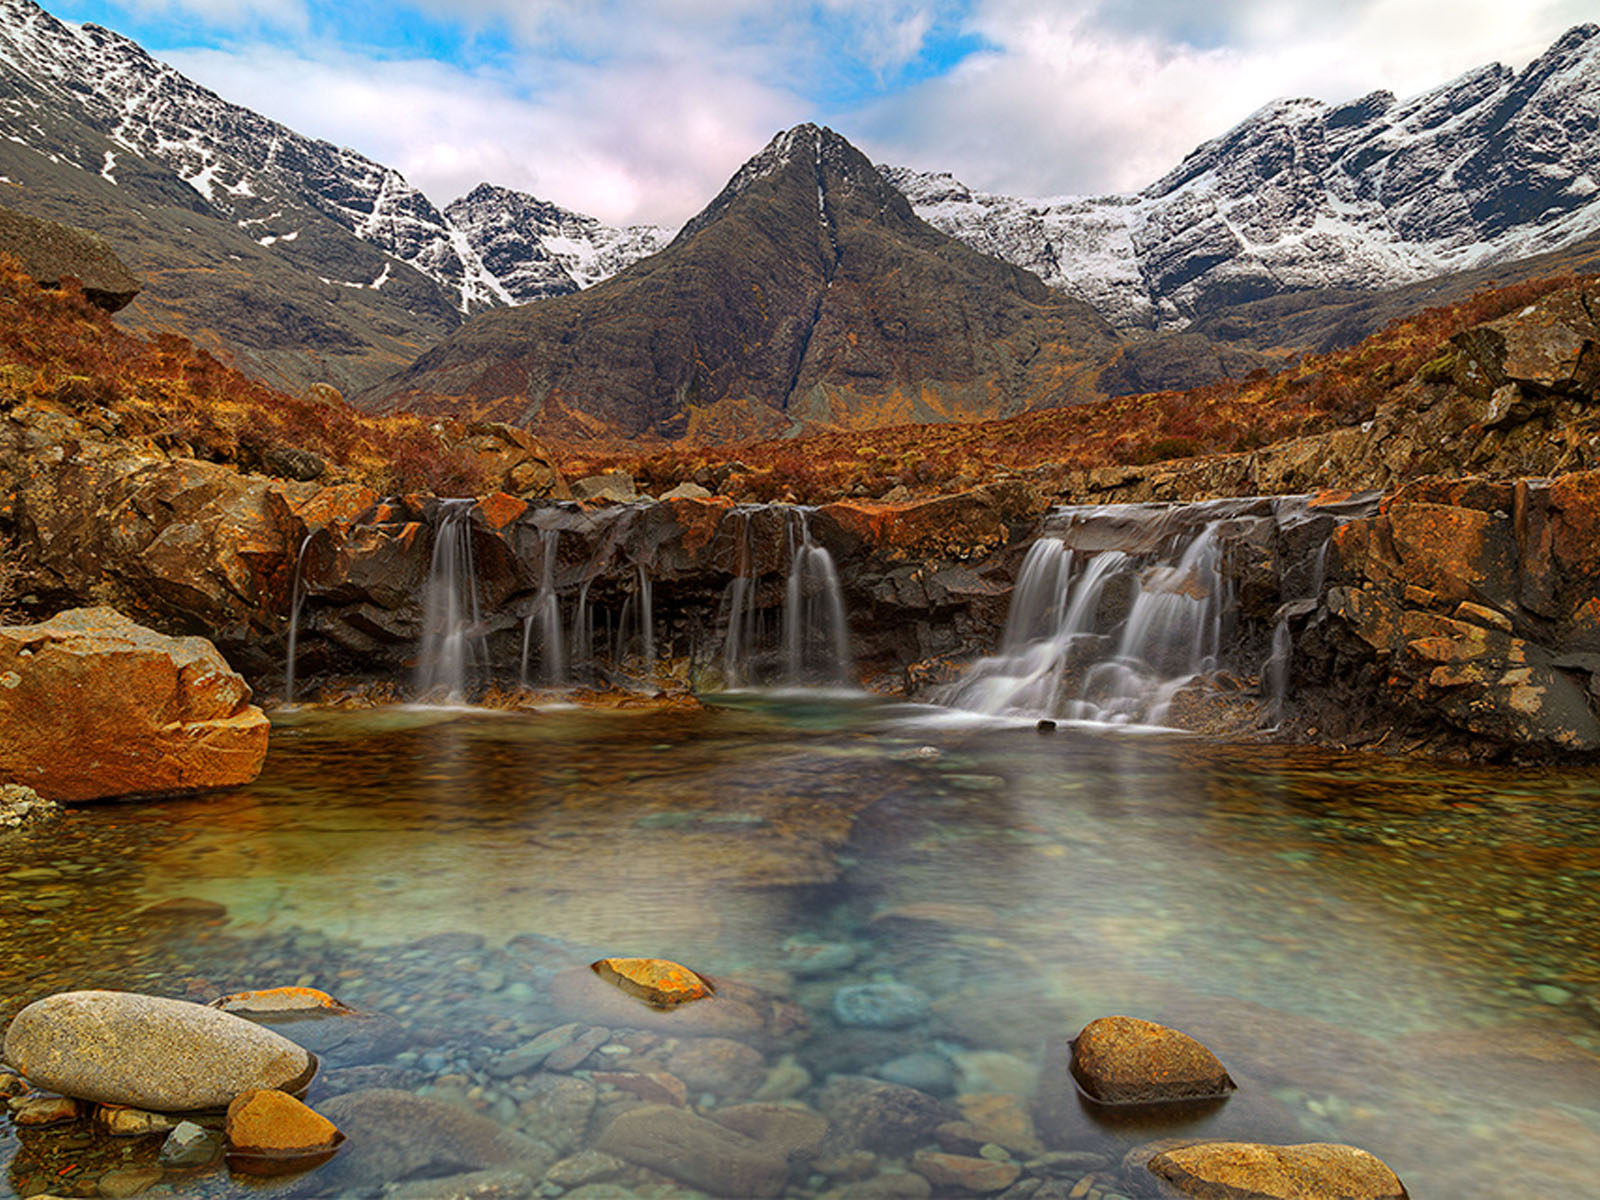 Bordered Iphone X Wallpaper Fairy Pools Isle Of Skye Scotland Desktop Wallpaper